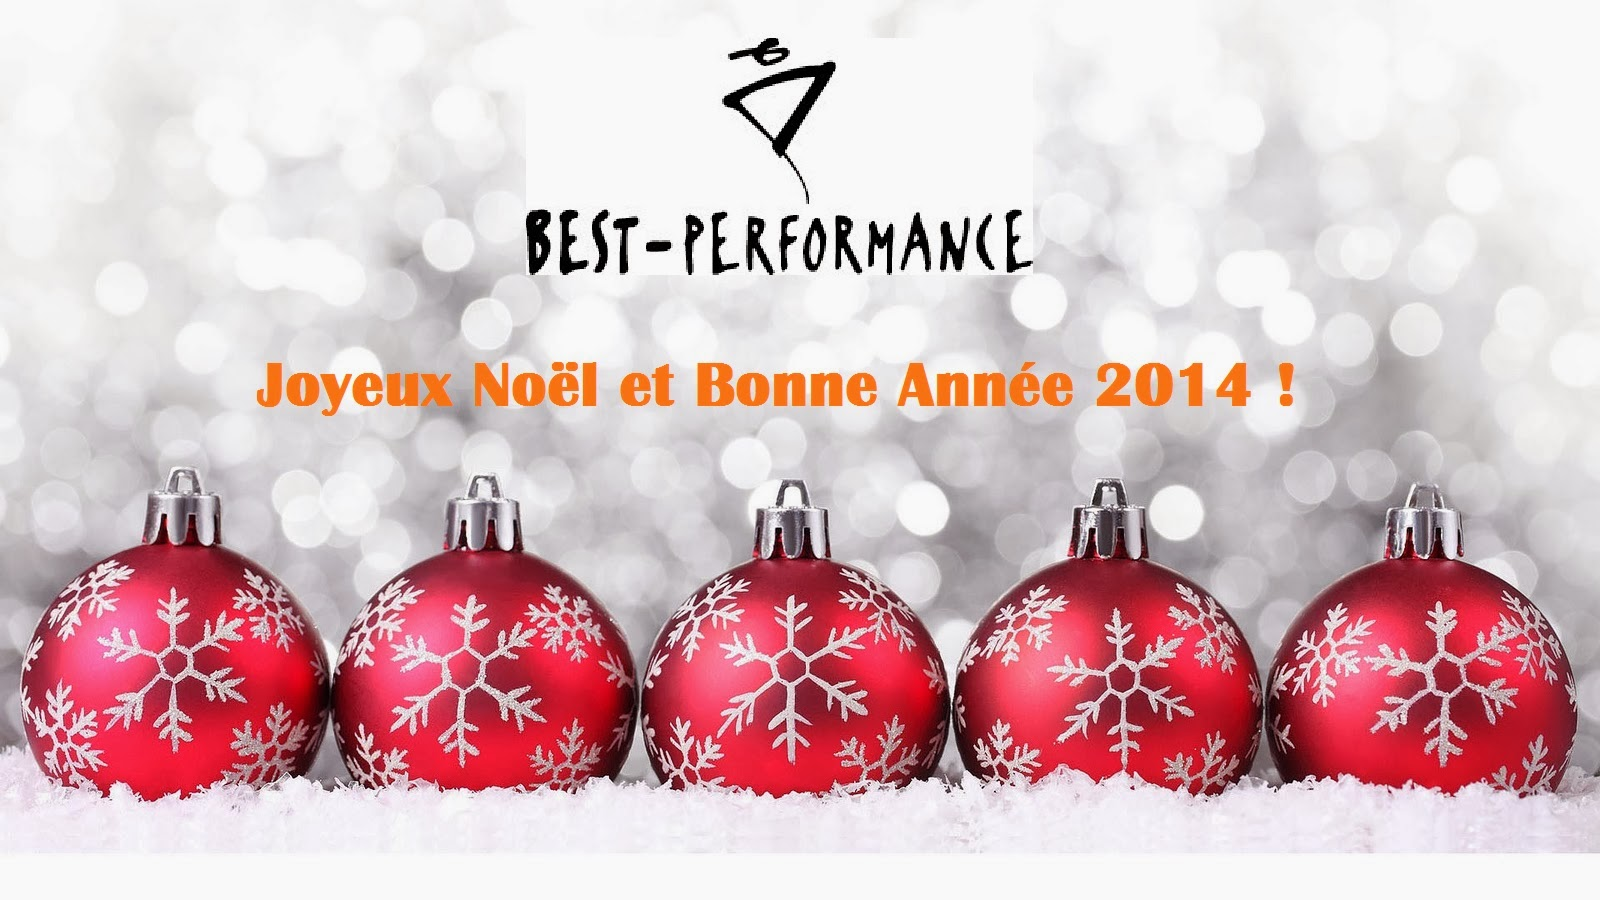 happy new year wallpapers 2016 joyeux noel et bonne ann e. Black Bedroom Furniture Sets. Home Design Ideas